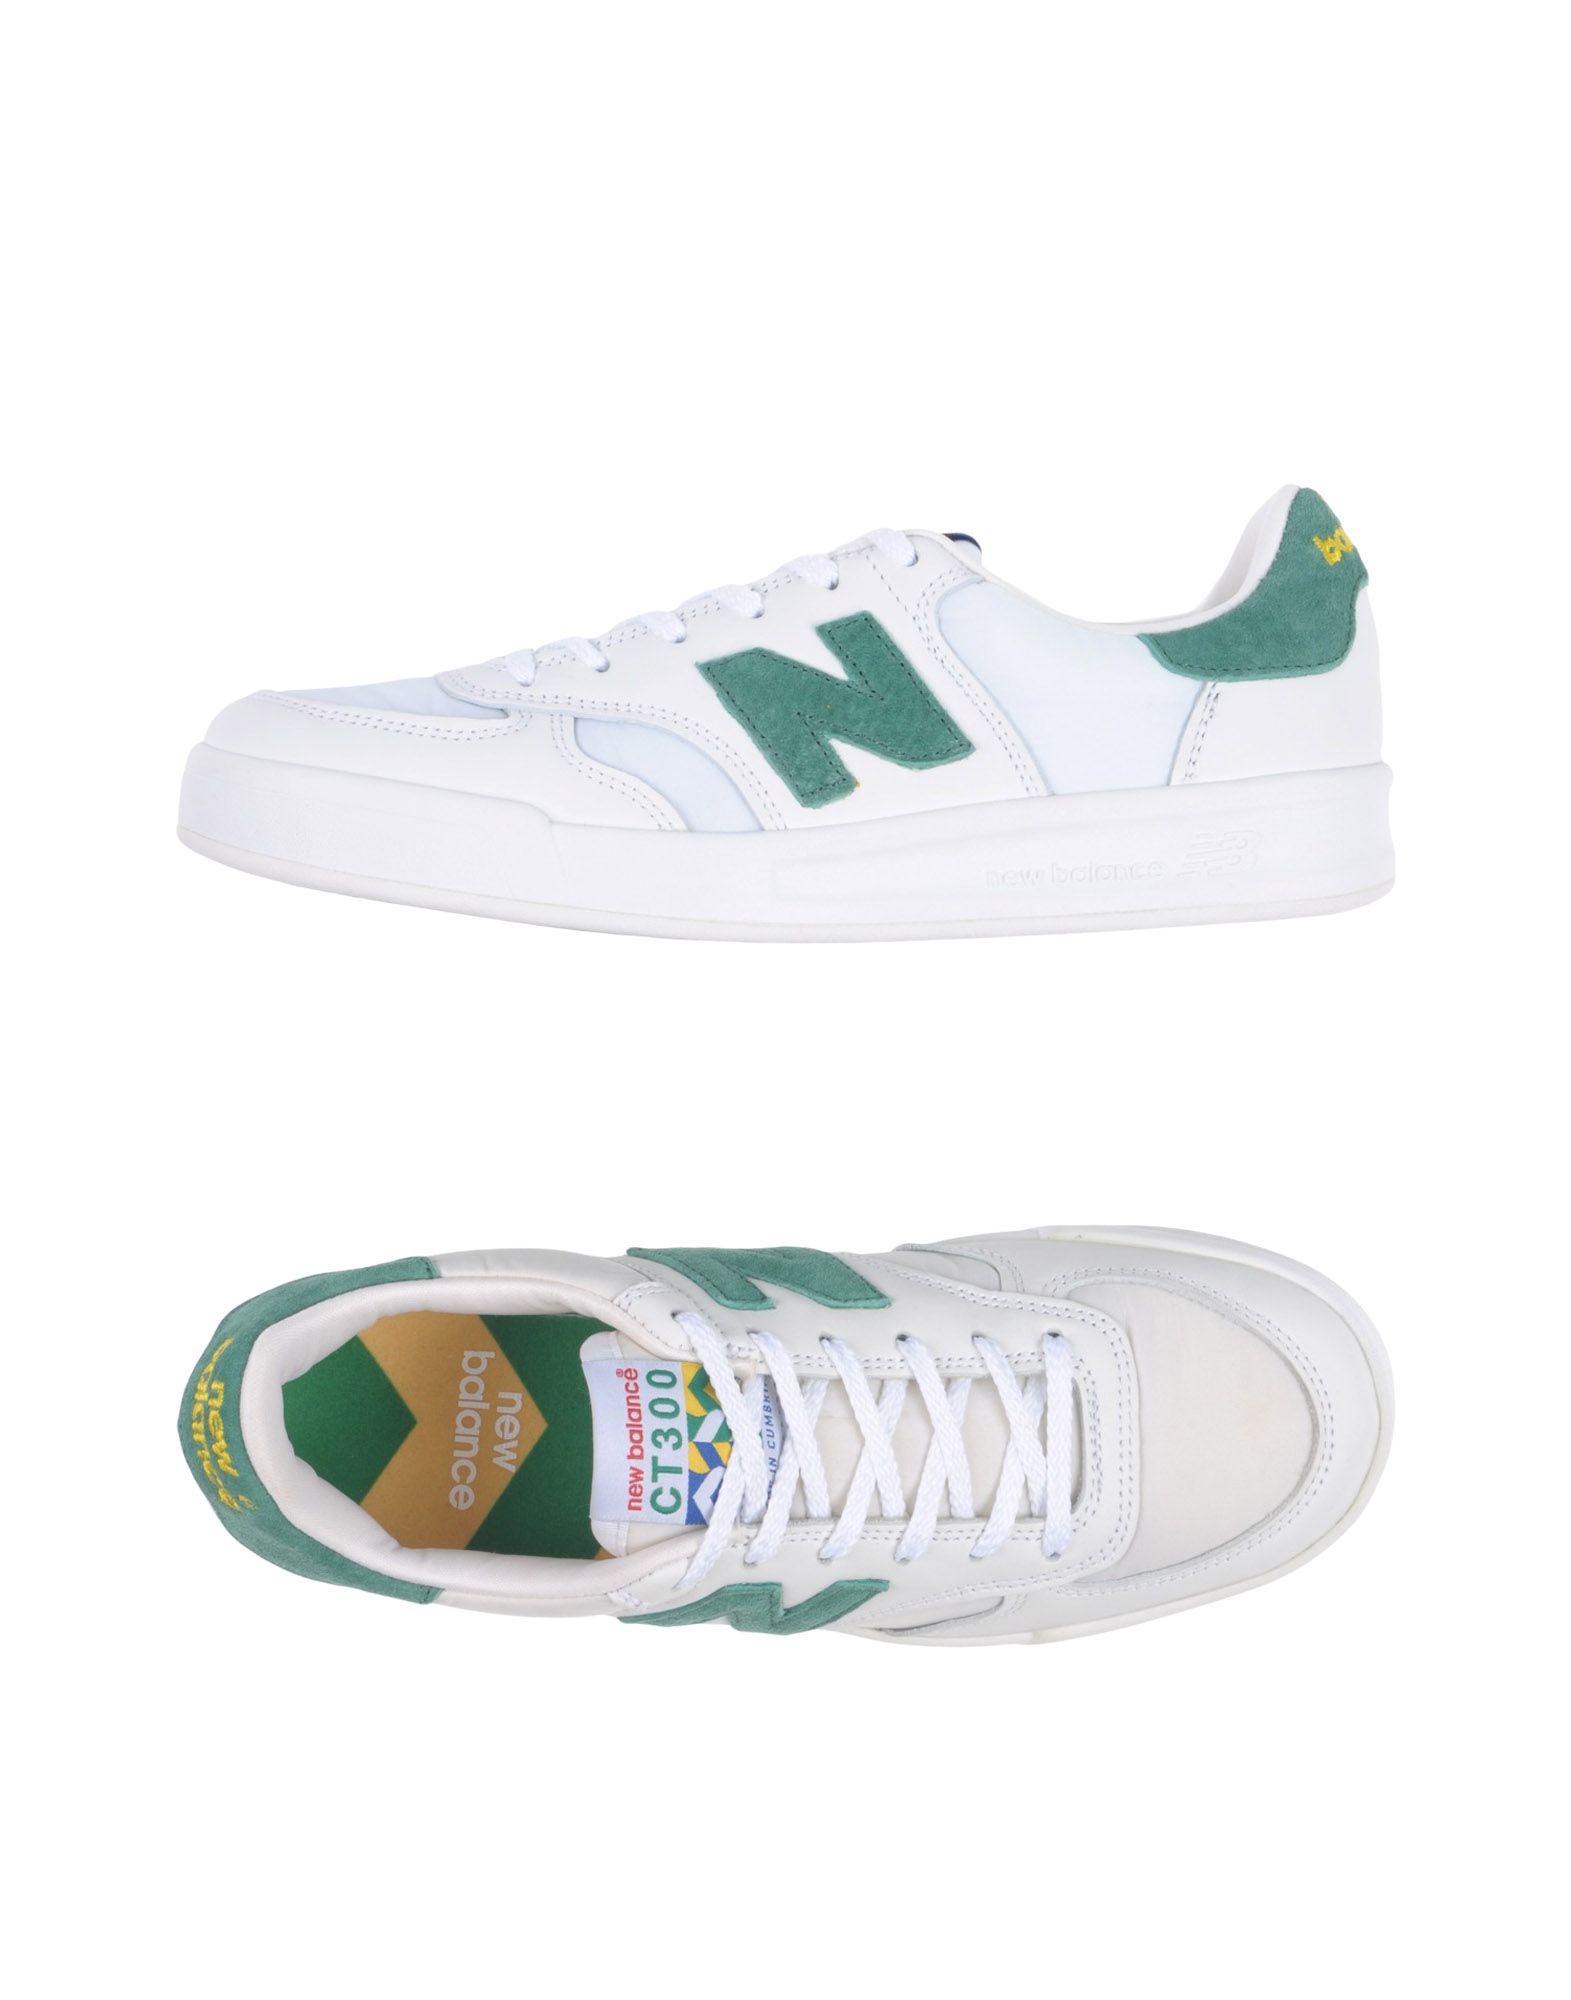 Sneakers New Balance Uomo - Acquista online su